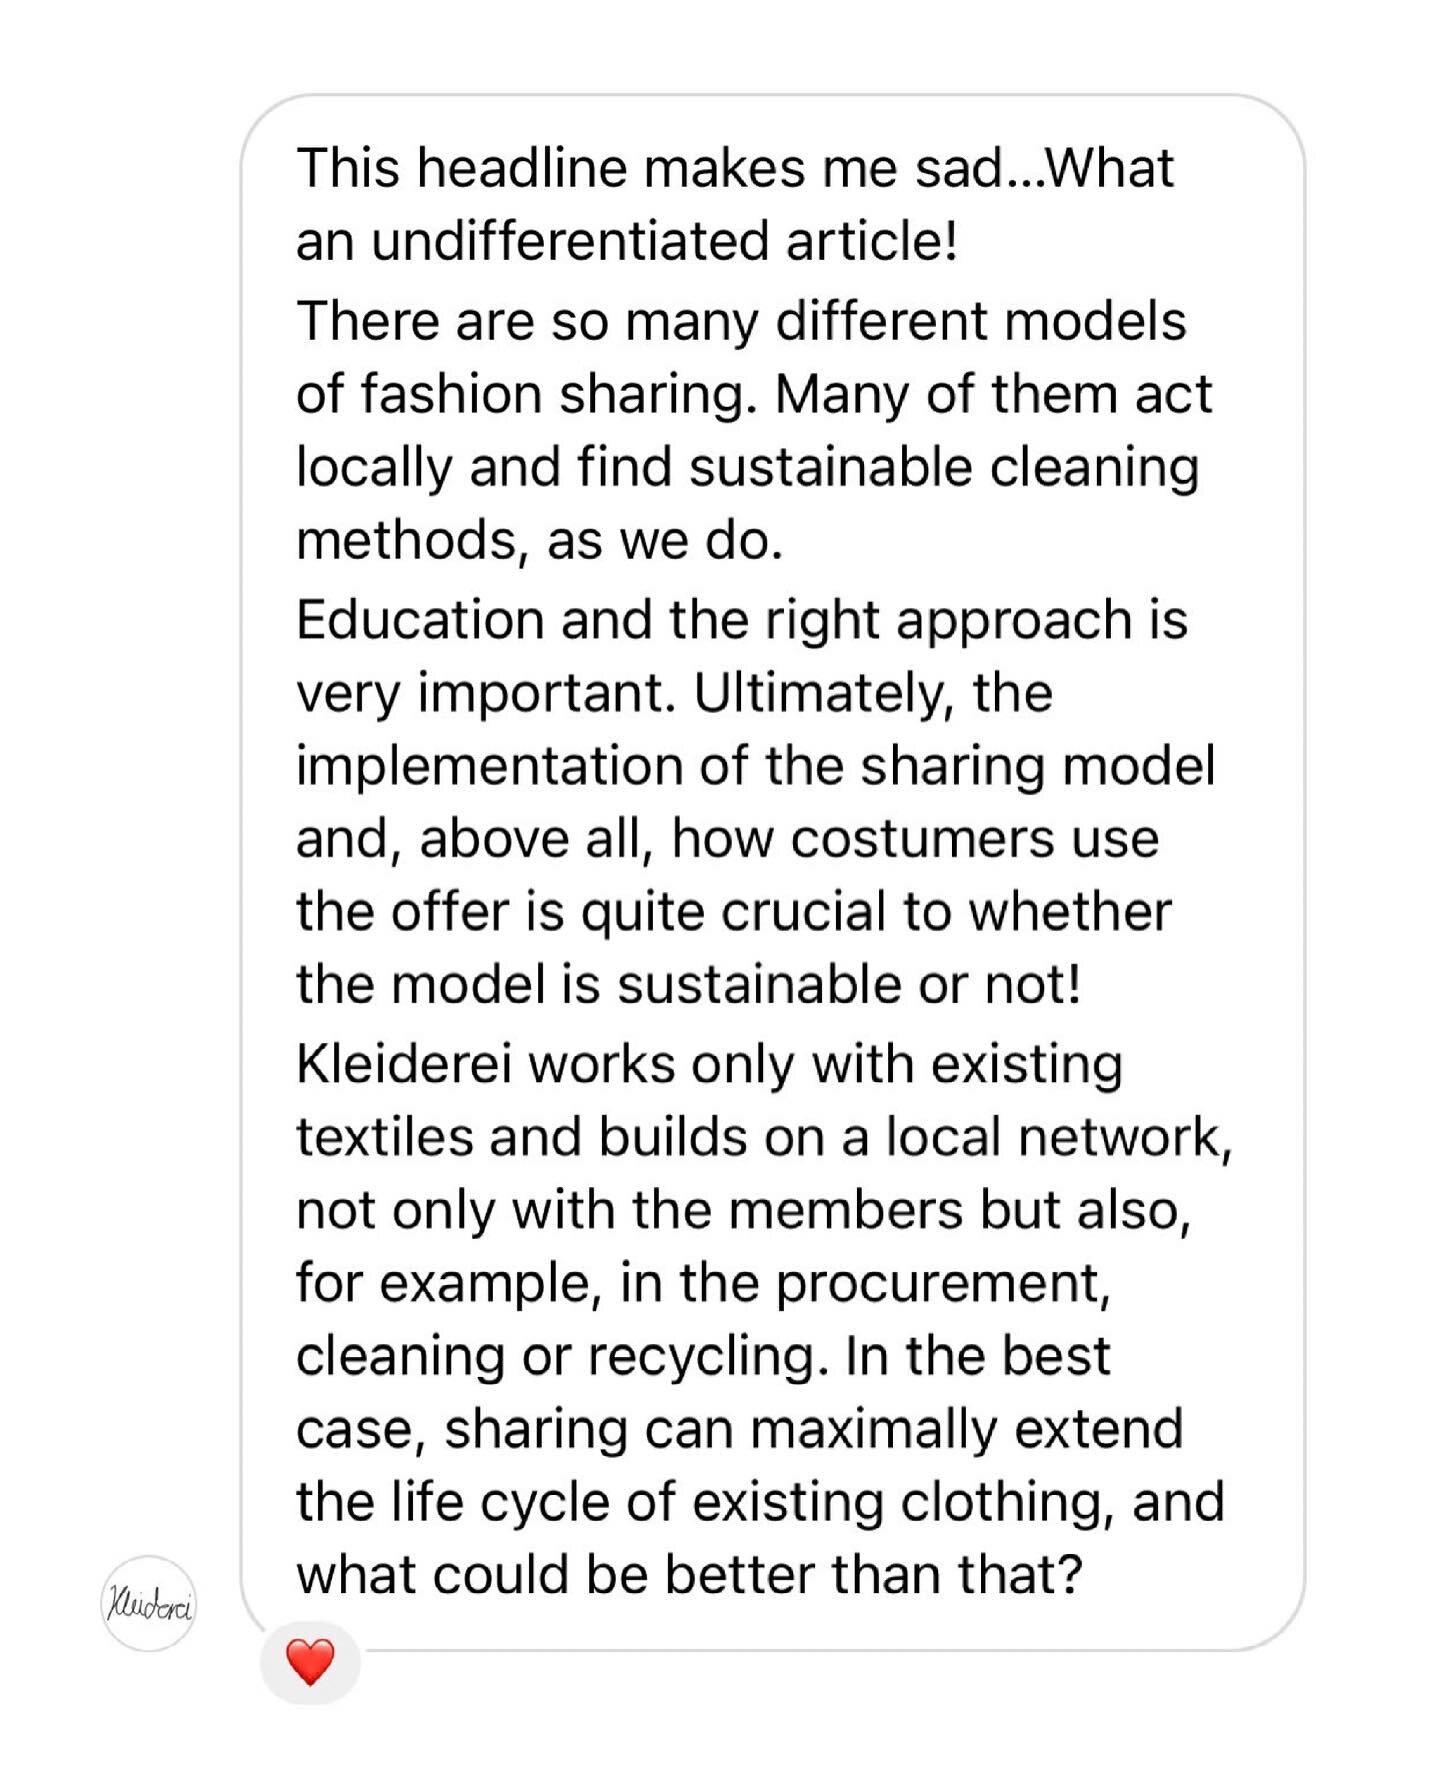 clothing-rental-sustainable-kleiderei.JPG